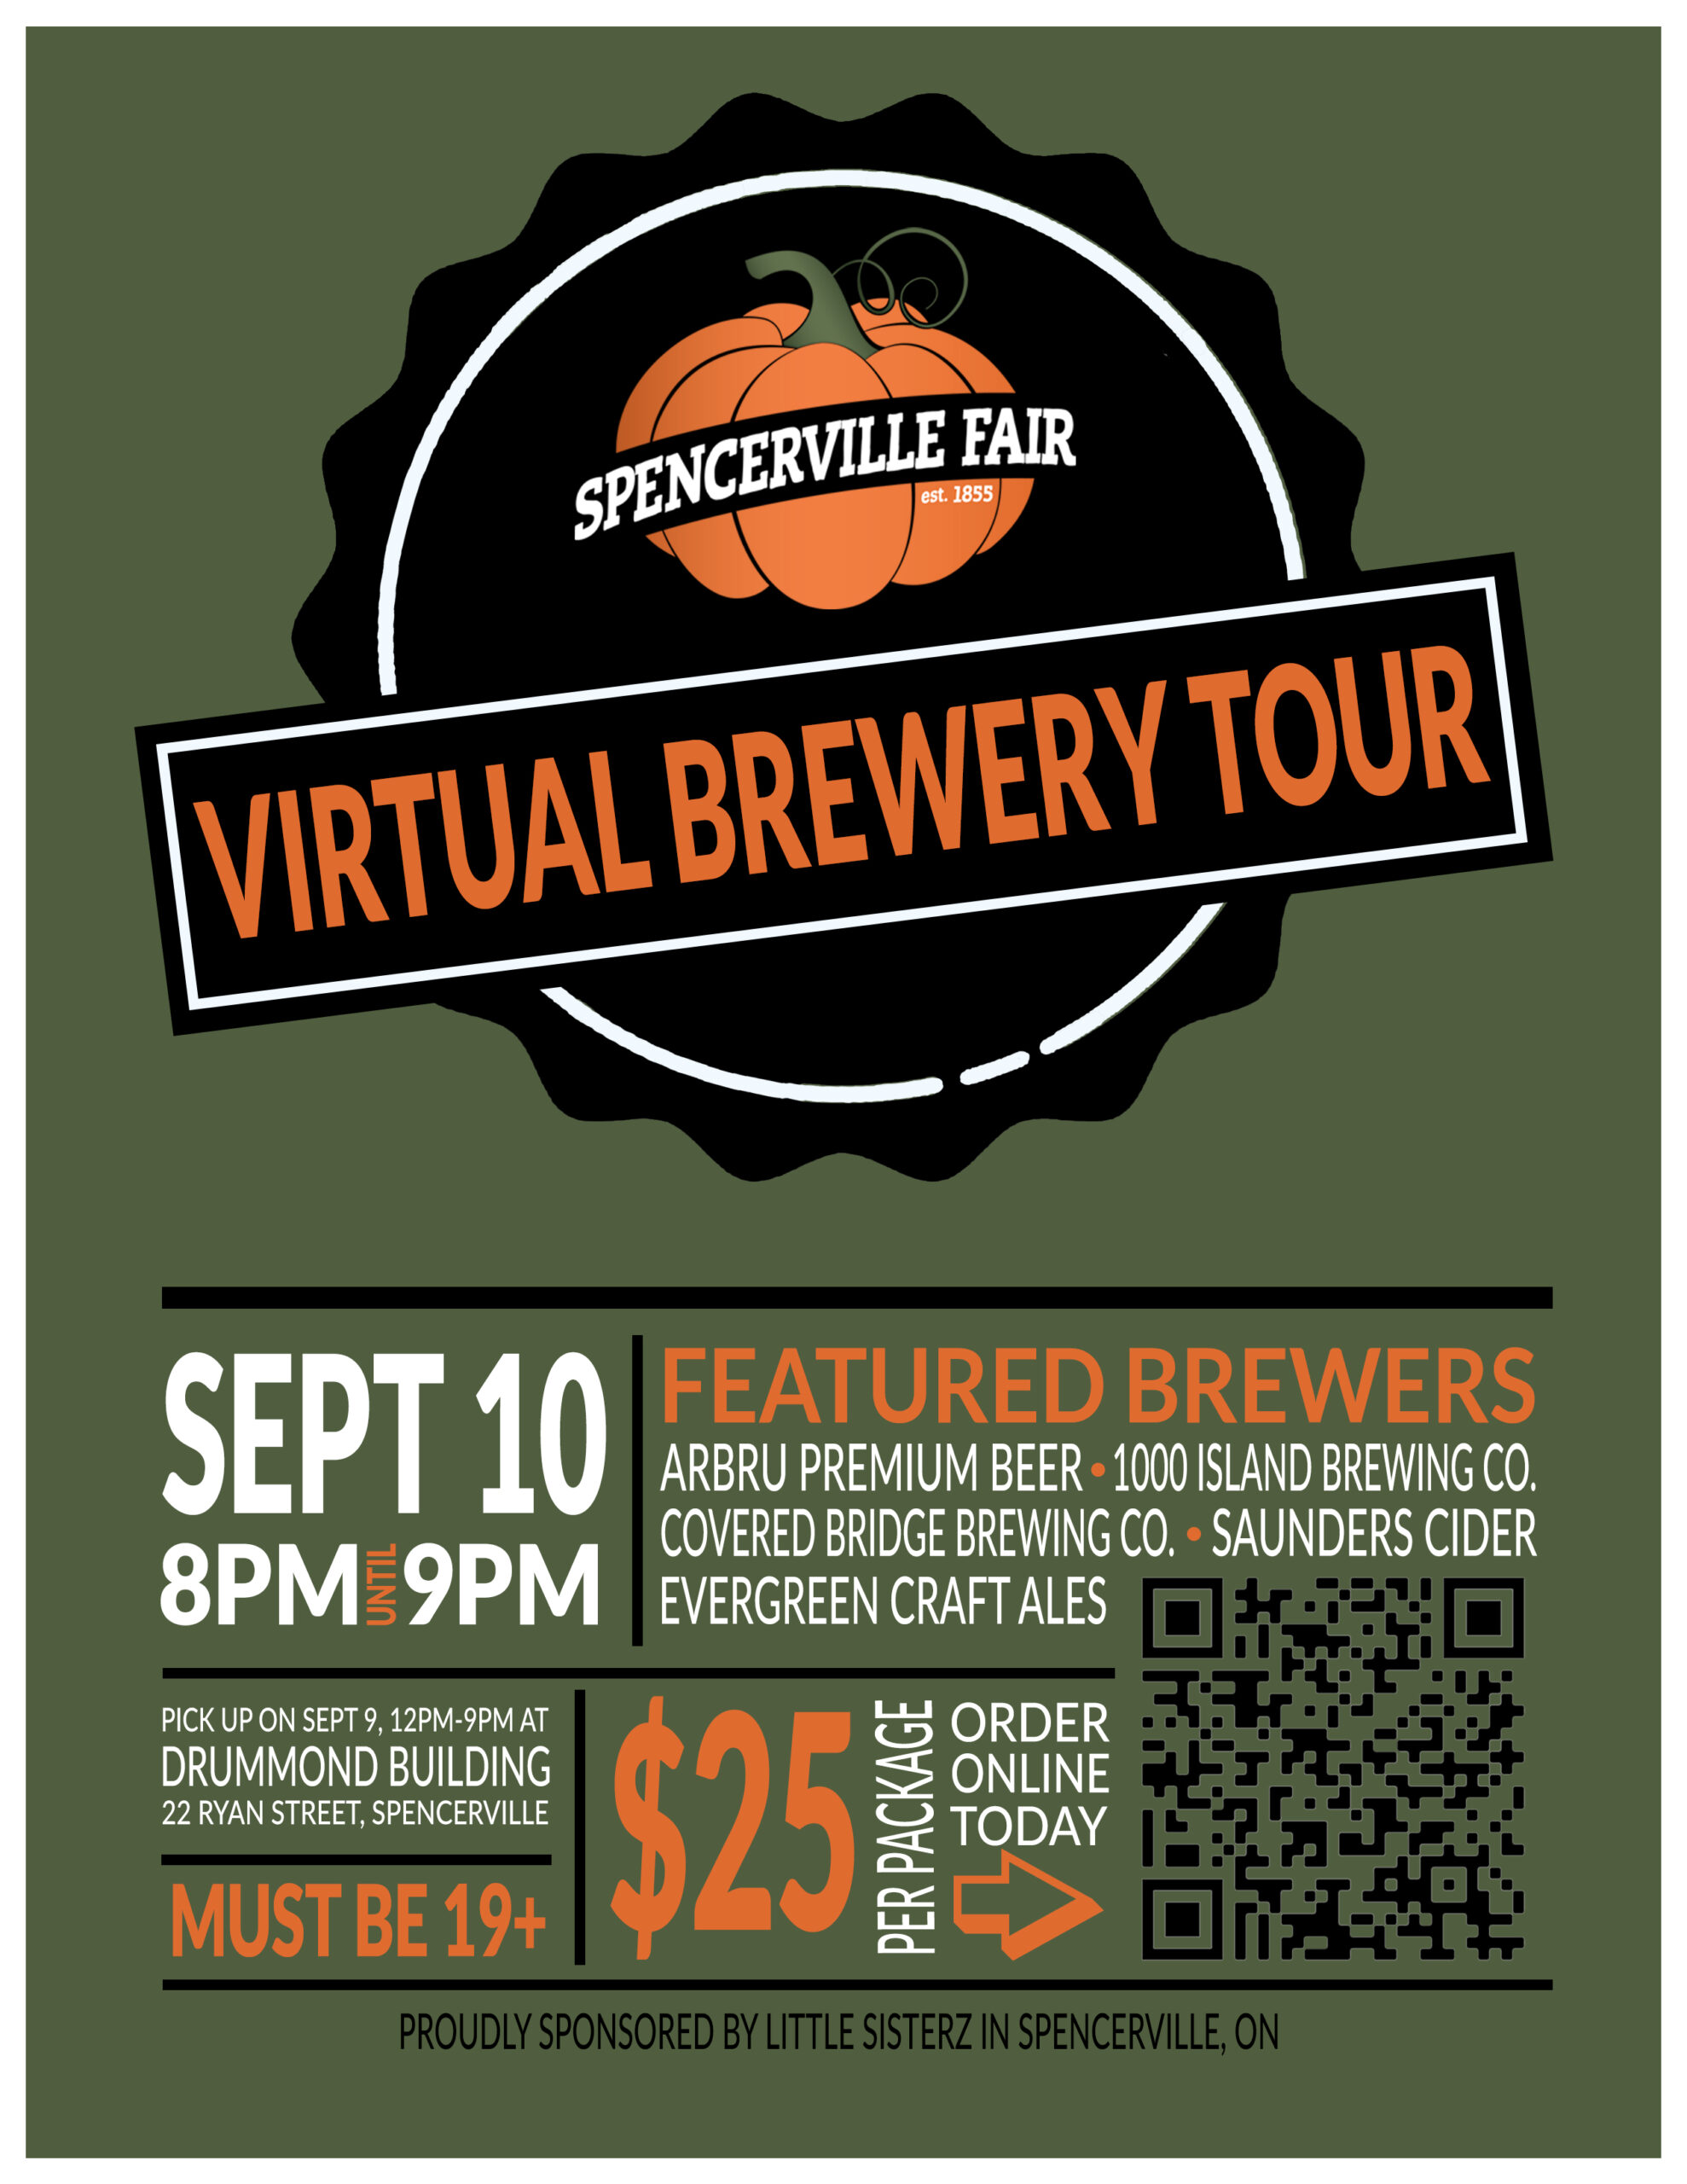 Spencerville Fair Virtual Brewery Tour @ Virtual